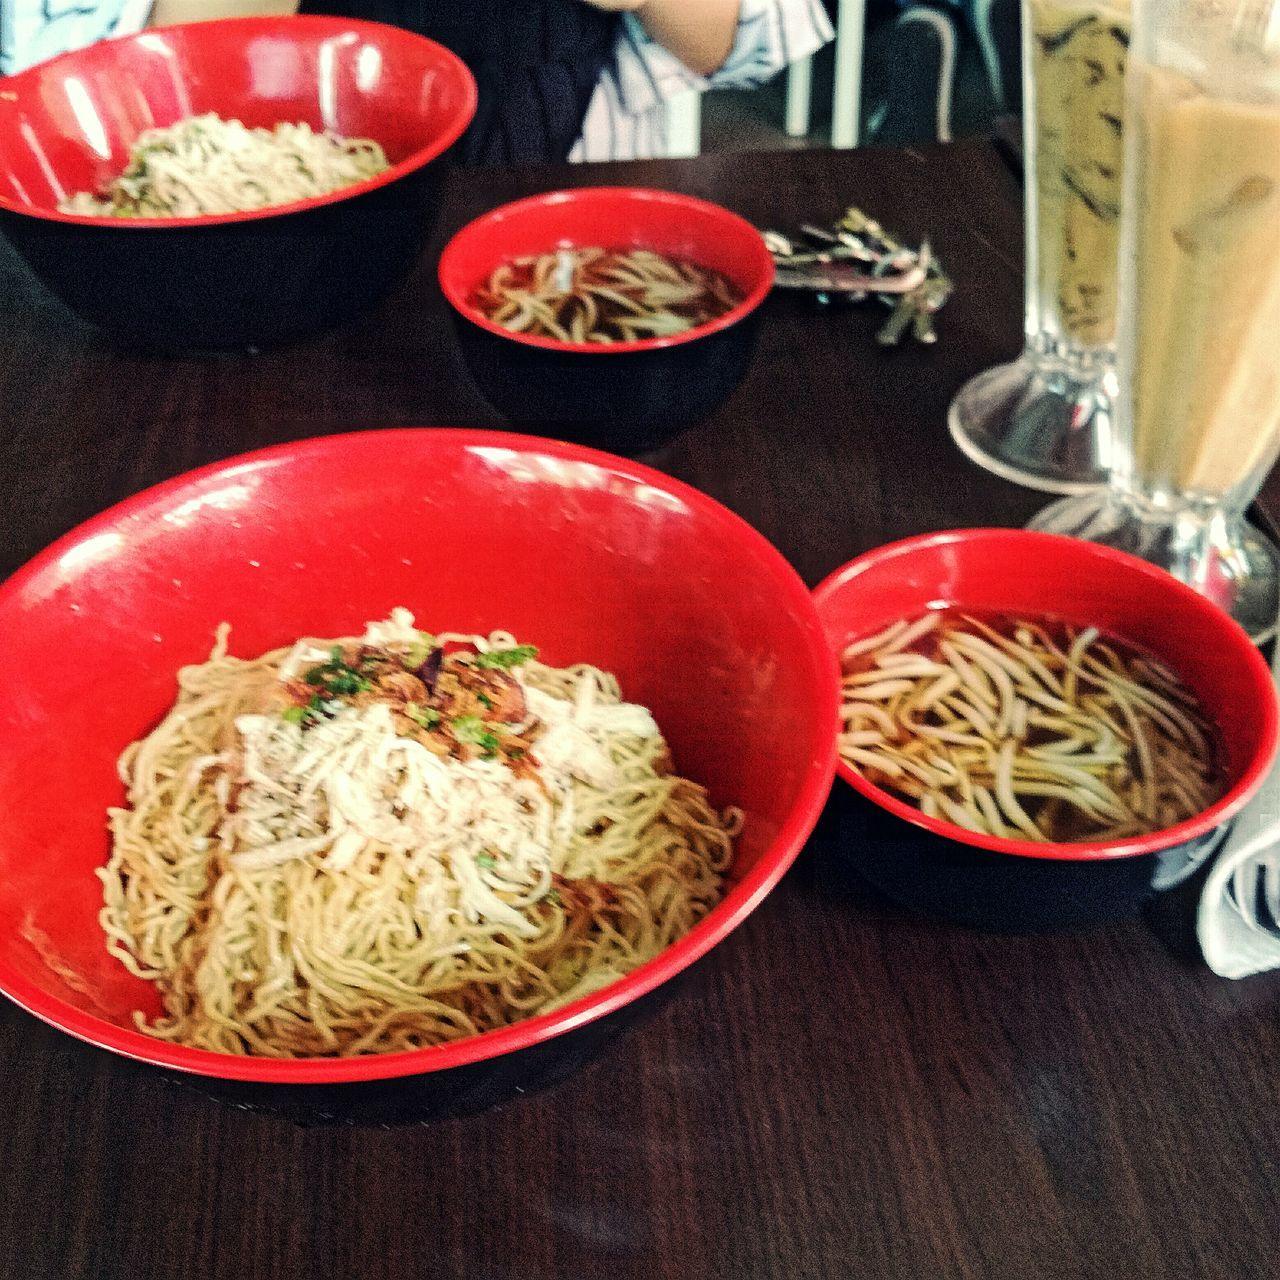 Kolokmee Food Kuala Lumpur DapurSarawak Lunch Time!